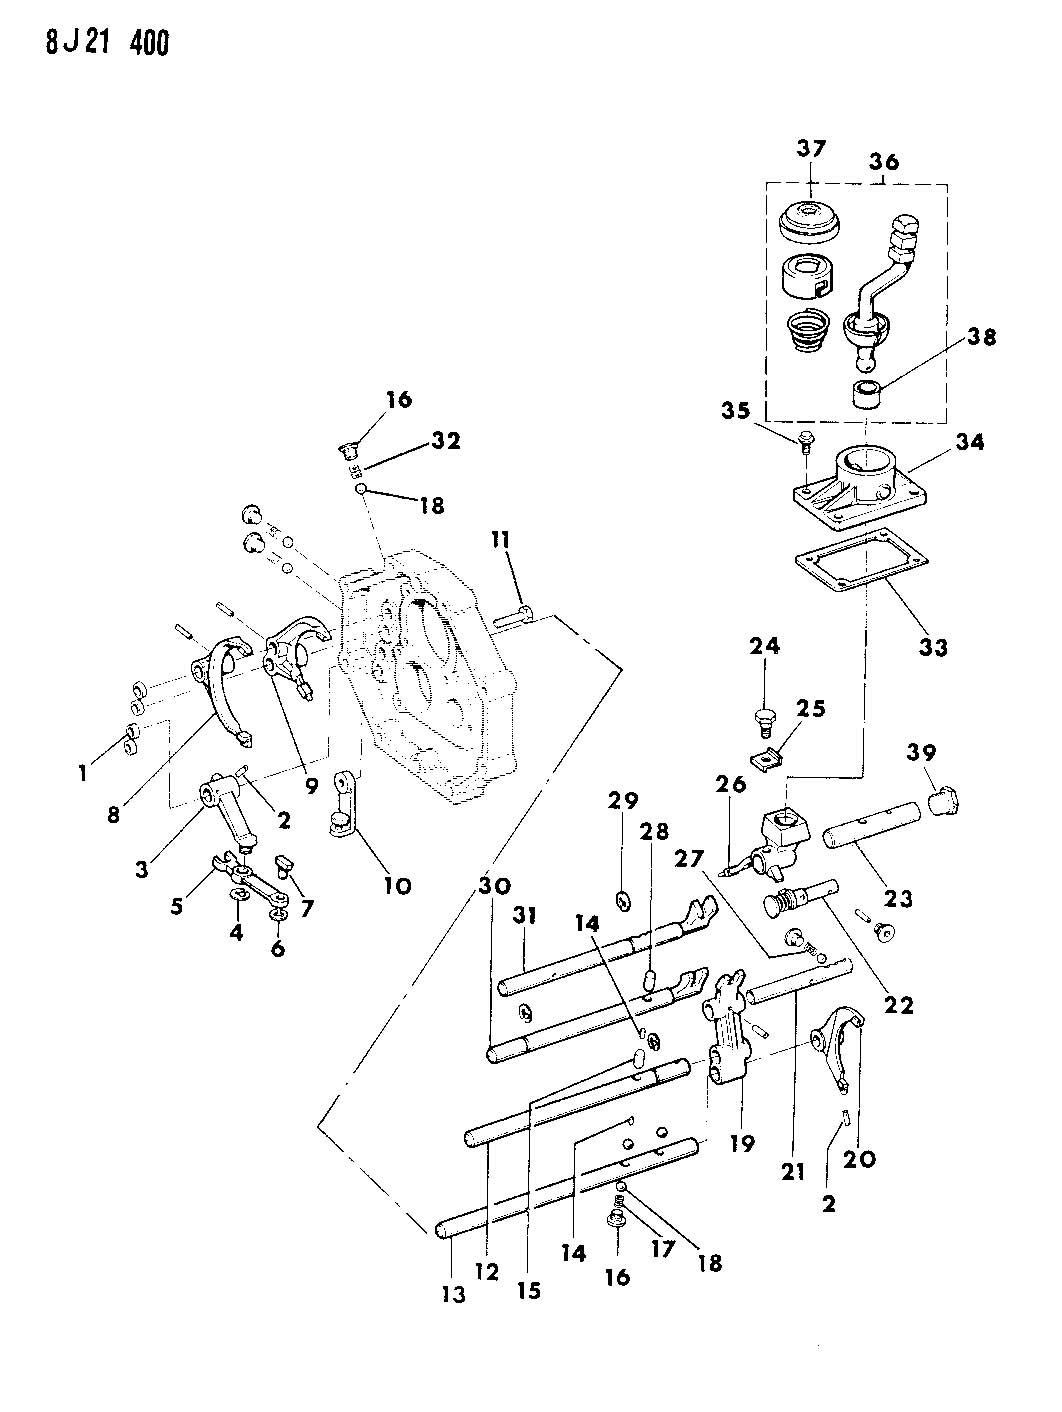 manual gear shifter for jeep wrangler